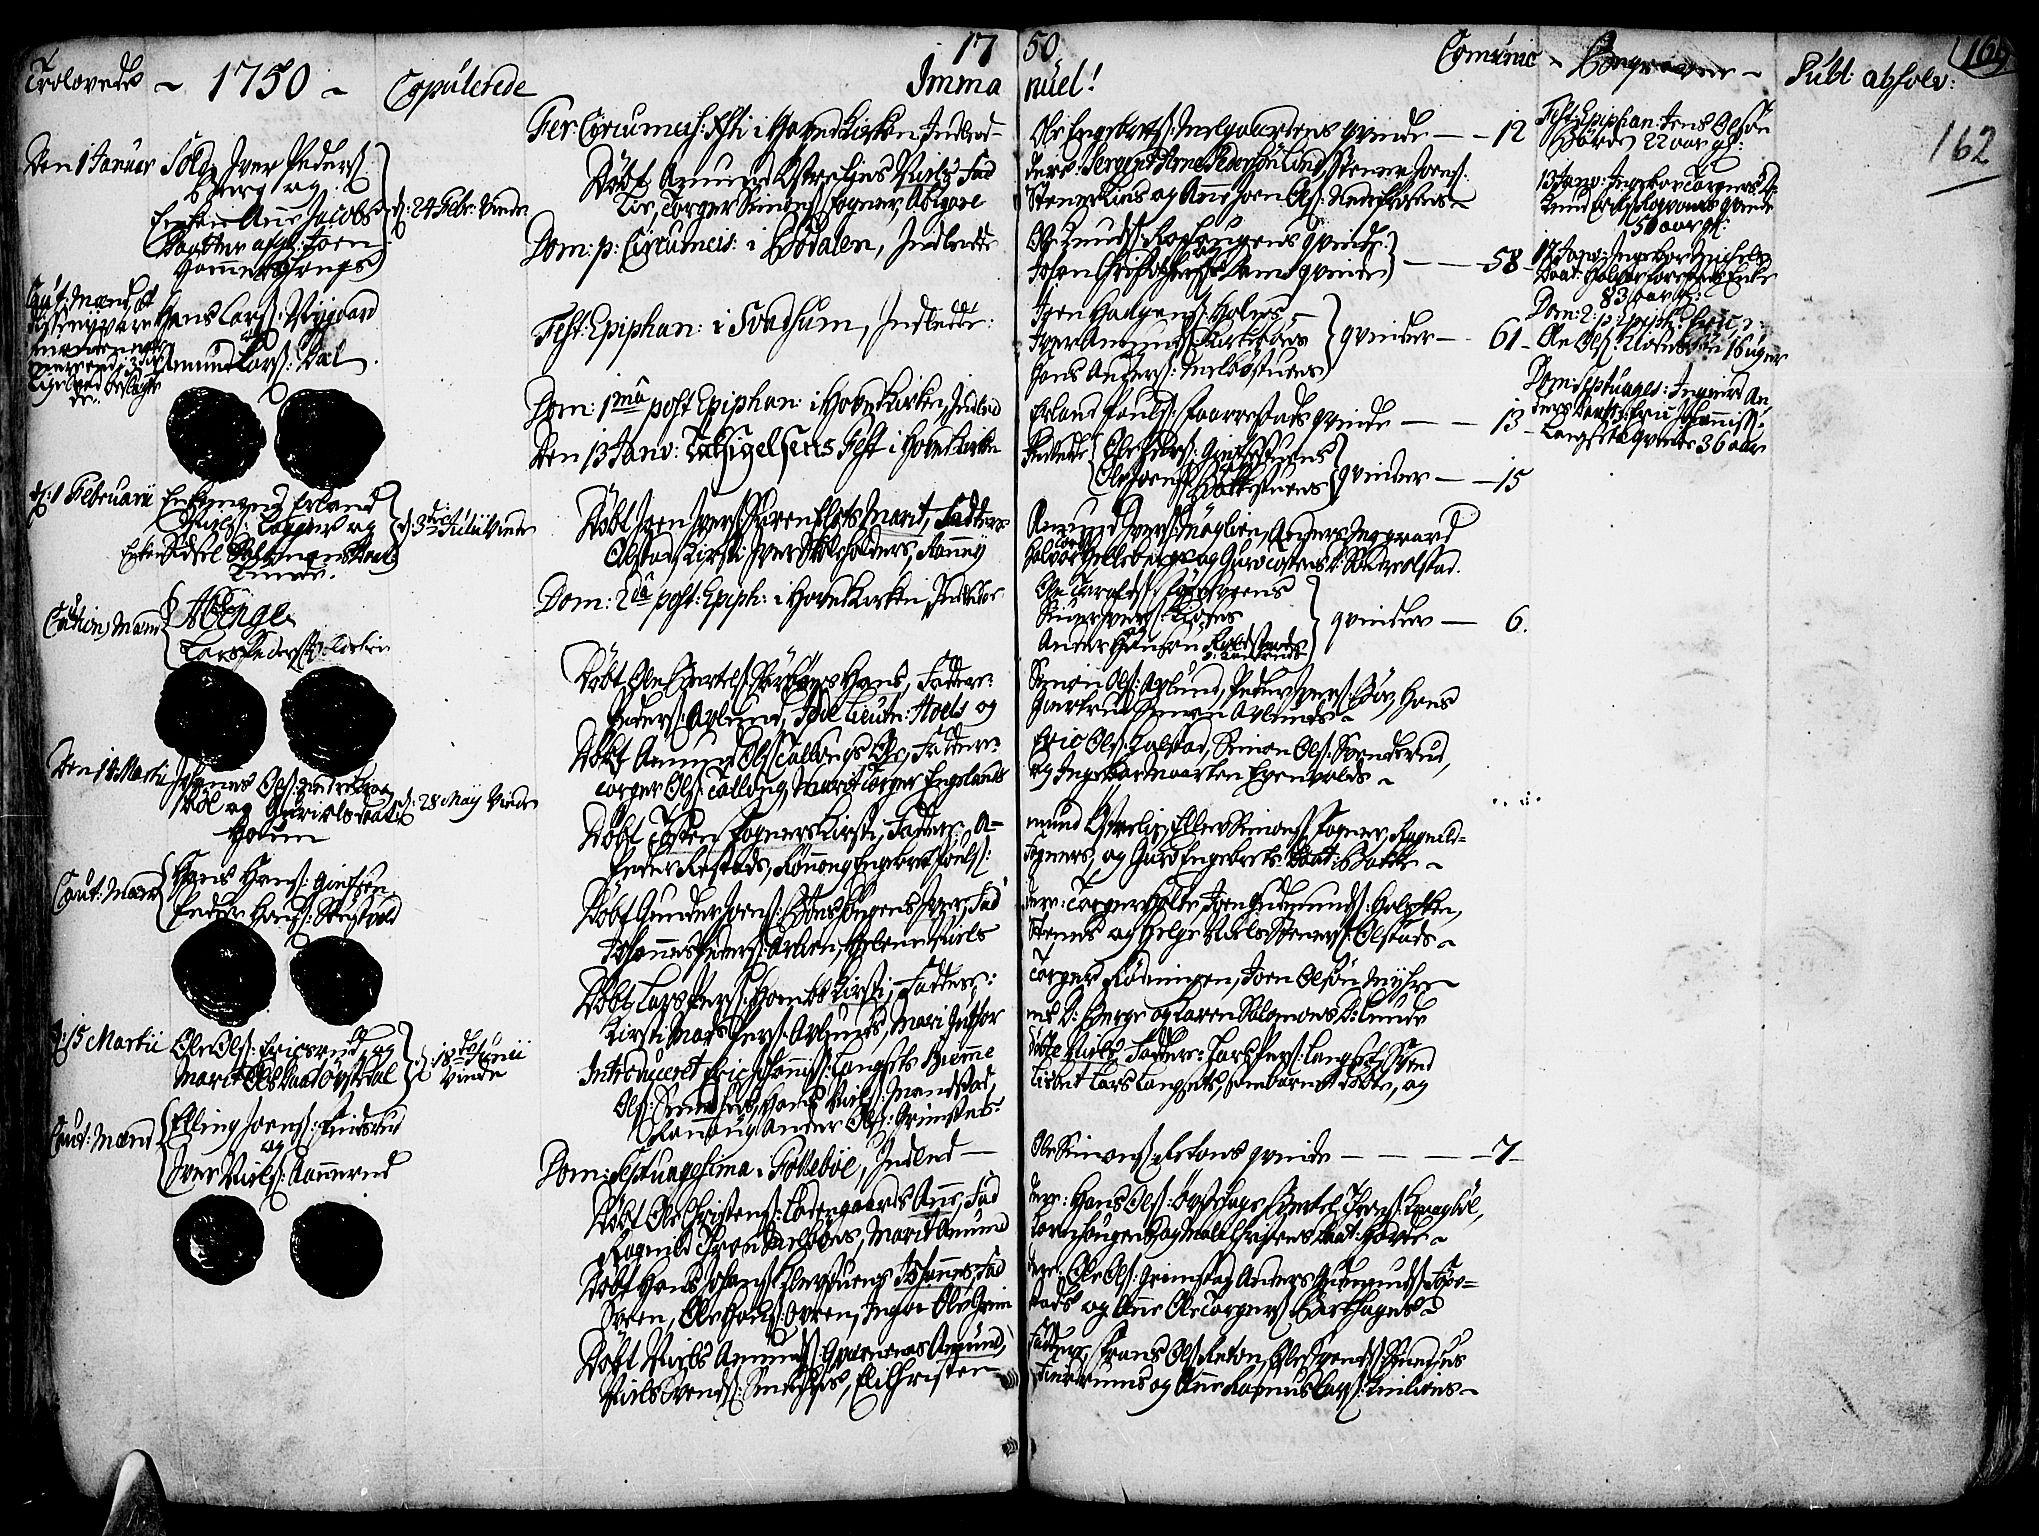 SAH, Gausdal prestekontor, Ministerialbok nr. 2, 1729-1757, s. 162